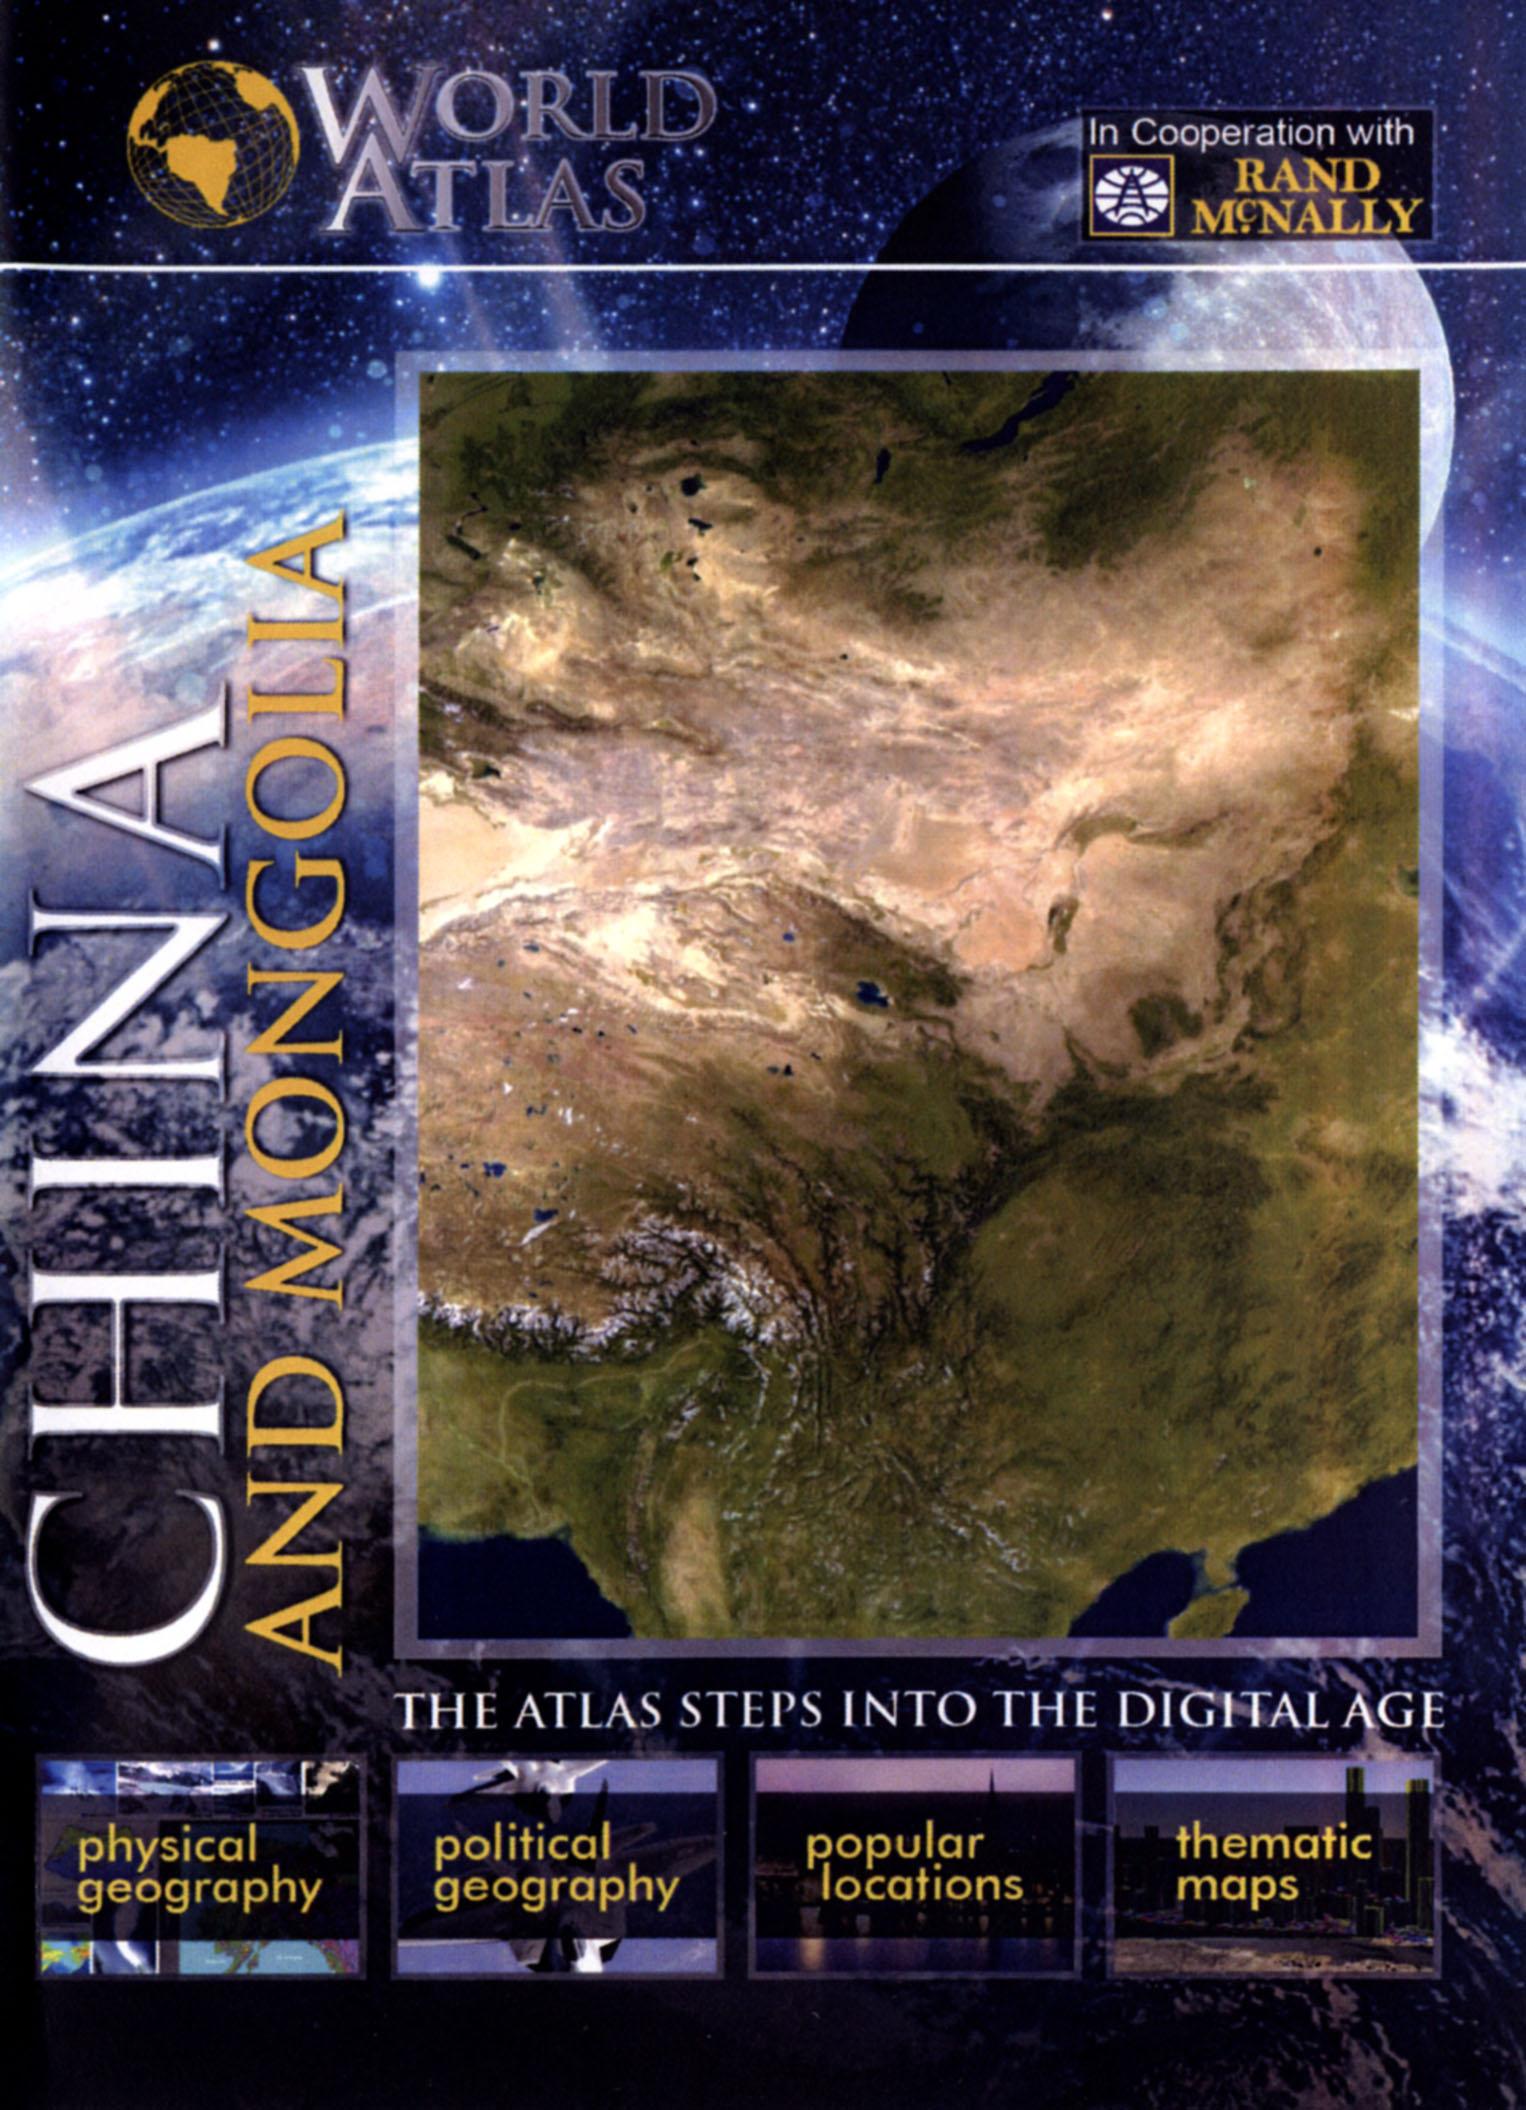 The World Atlas: China and Mongolia